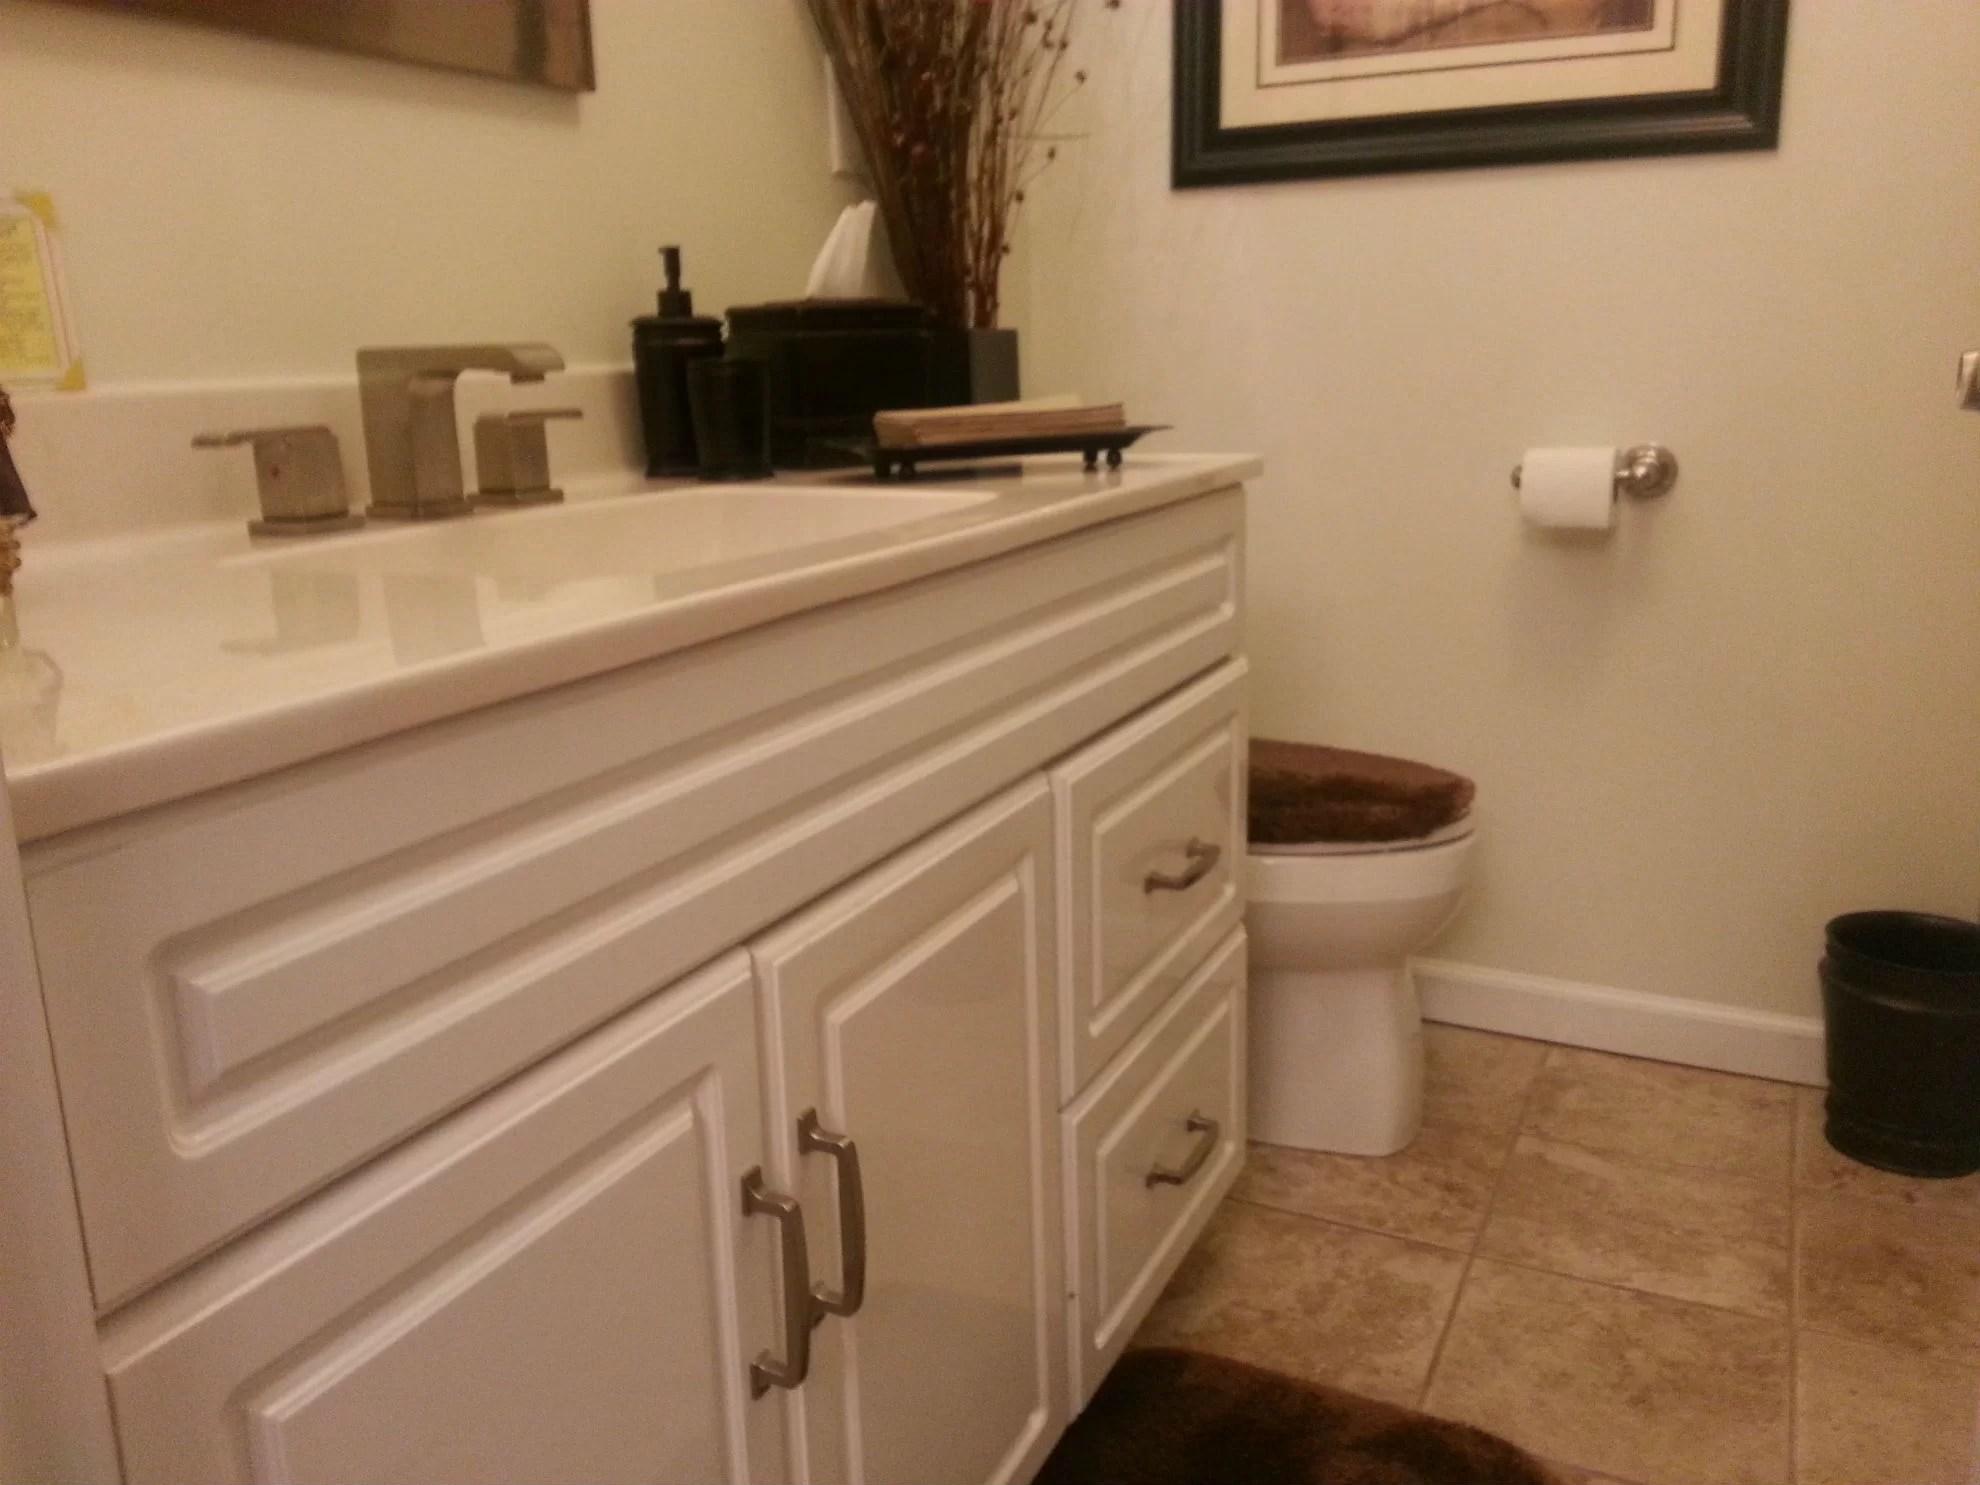 Bathroom Remodeling Experts  The Basic Bathroom Co